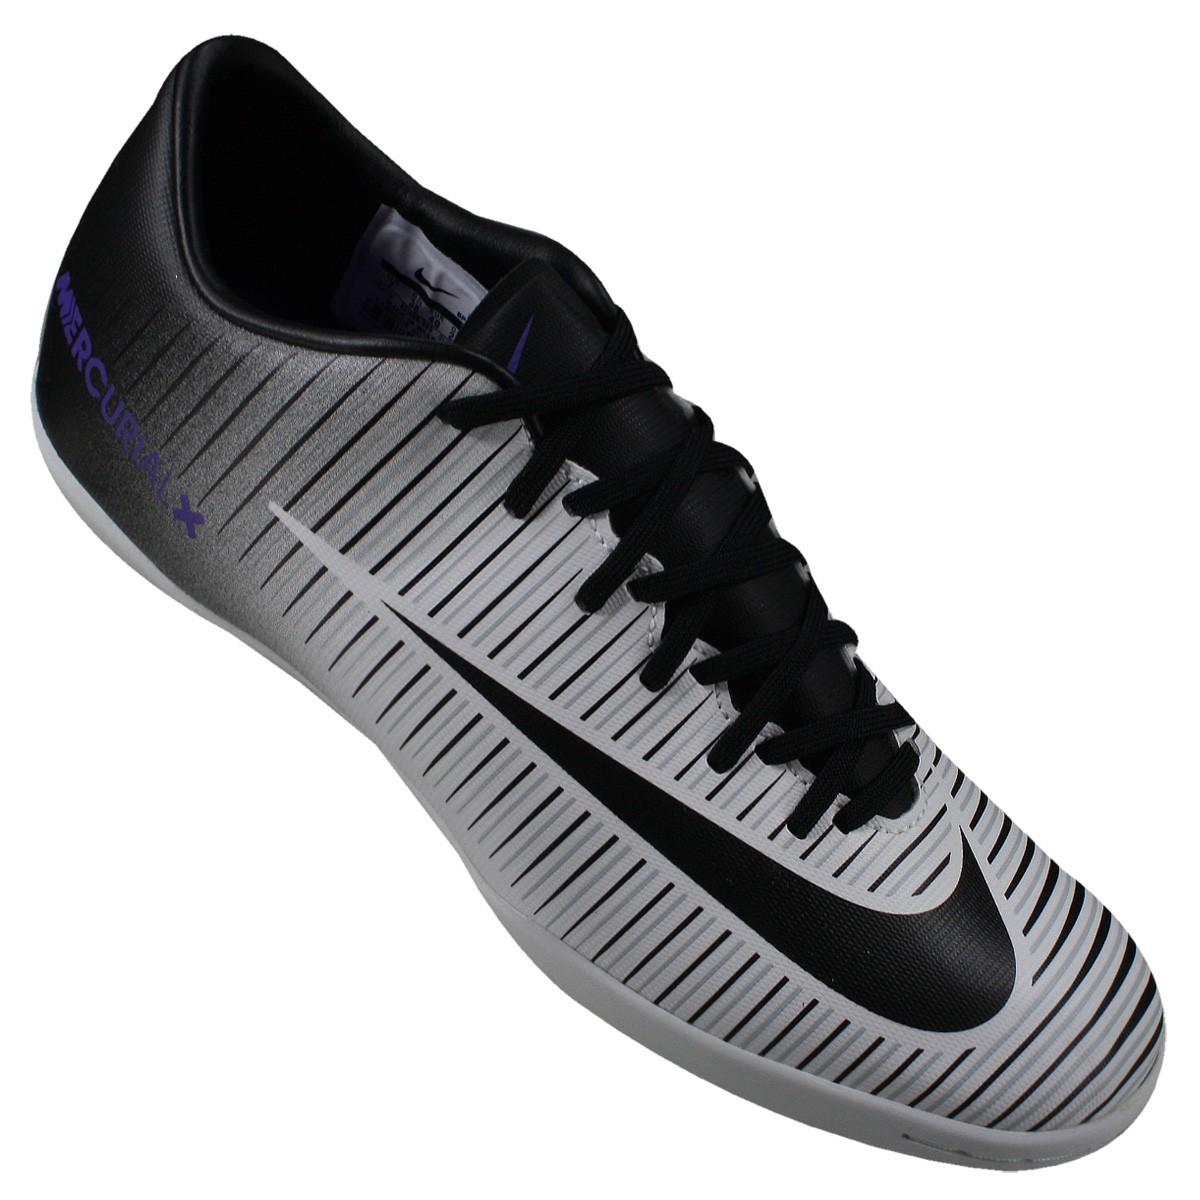 15bbfd6710 Indoor Nike Mercurial Victory VI IC 831966 005 Preto Branco Roxo